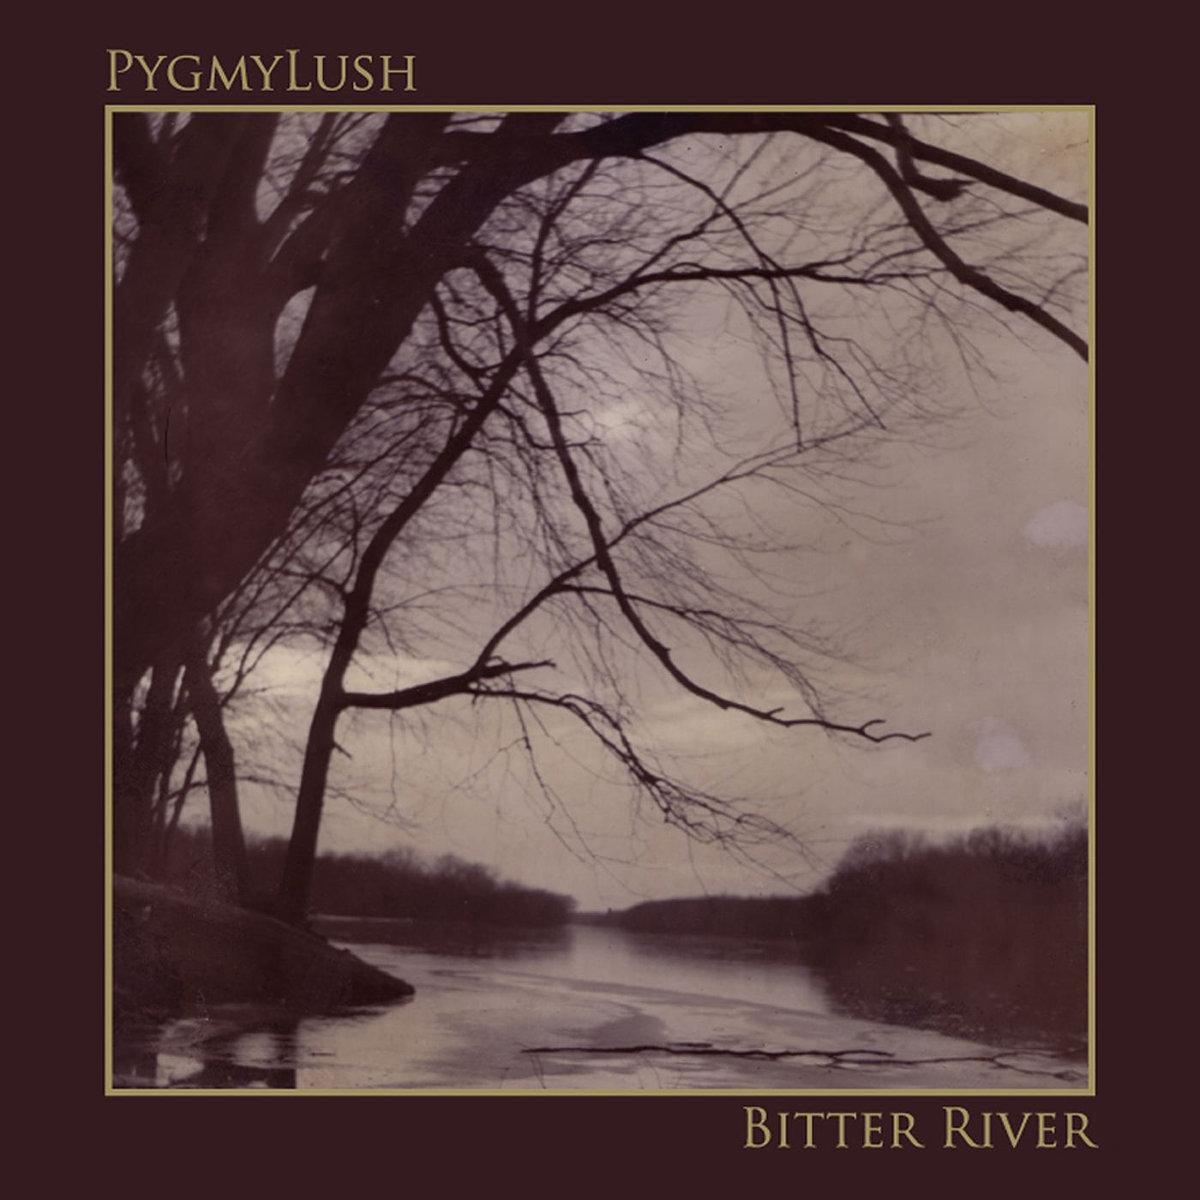 Pygmy Lush - Bitter River 12